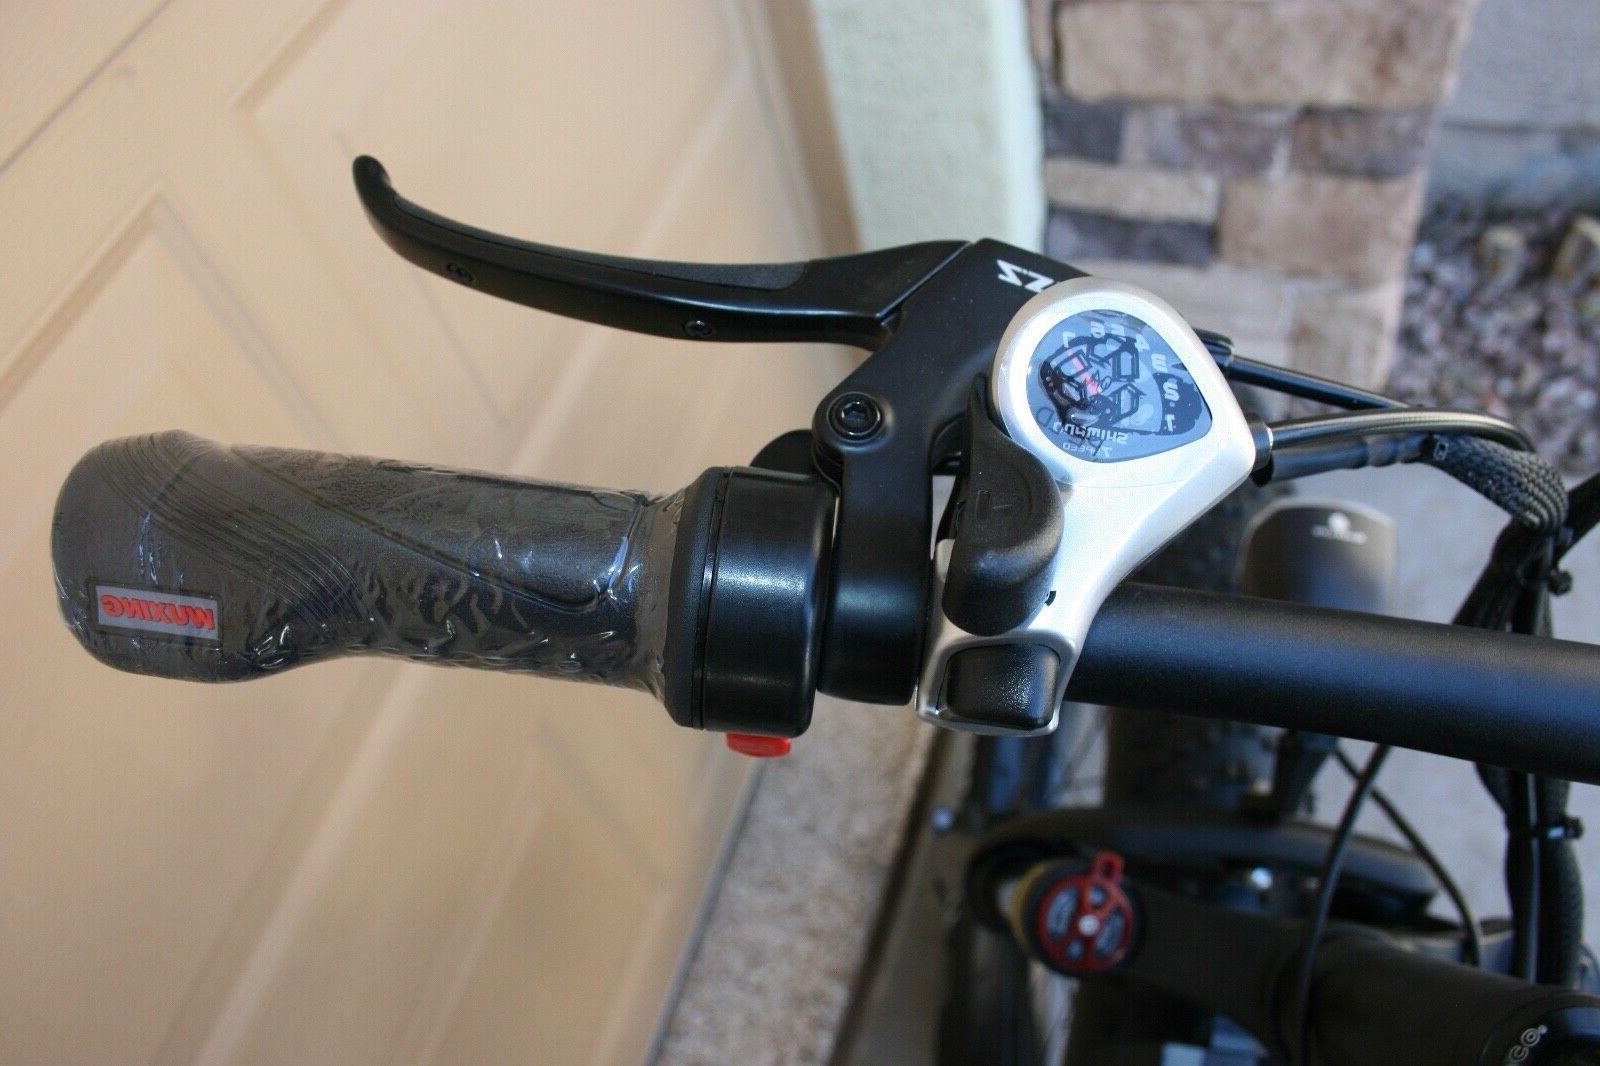 E Bicycle Bafang Folding Step Through Fat 48v 21ah